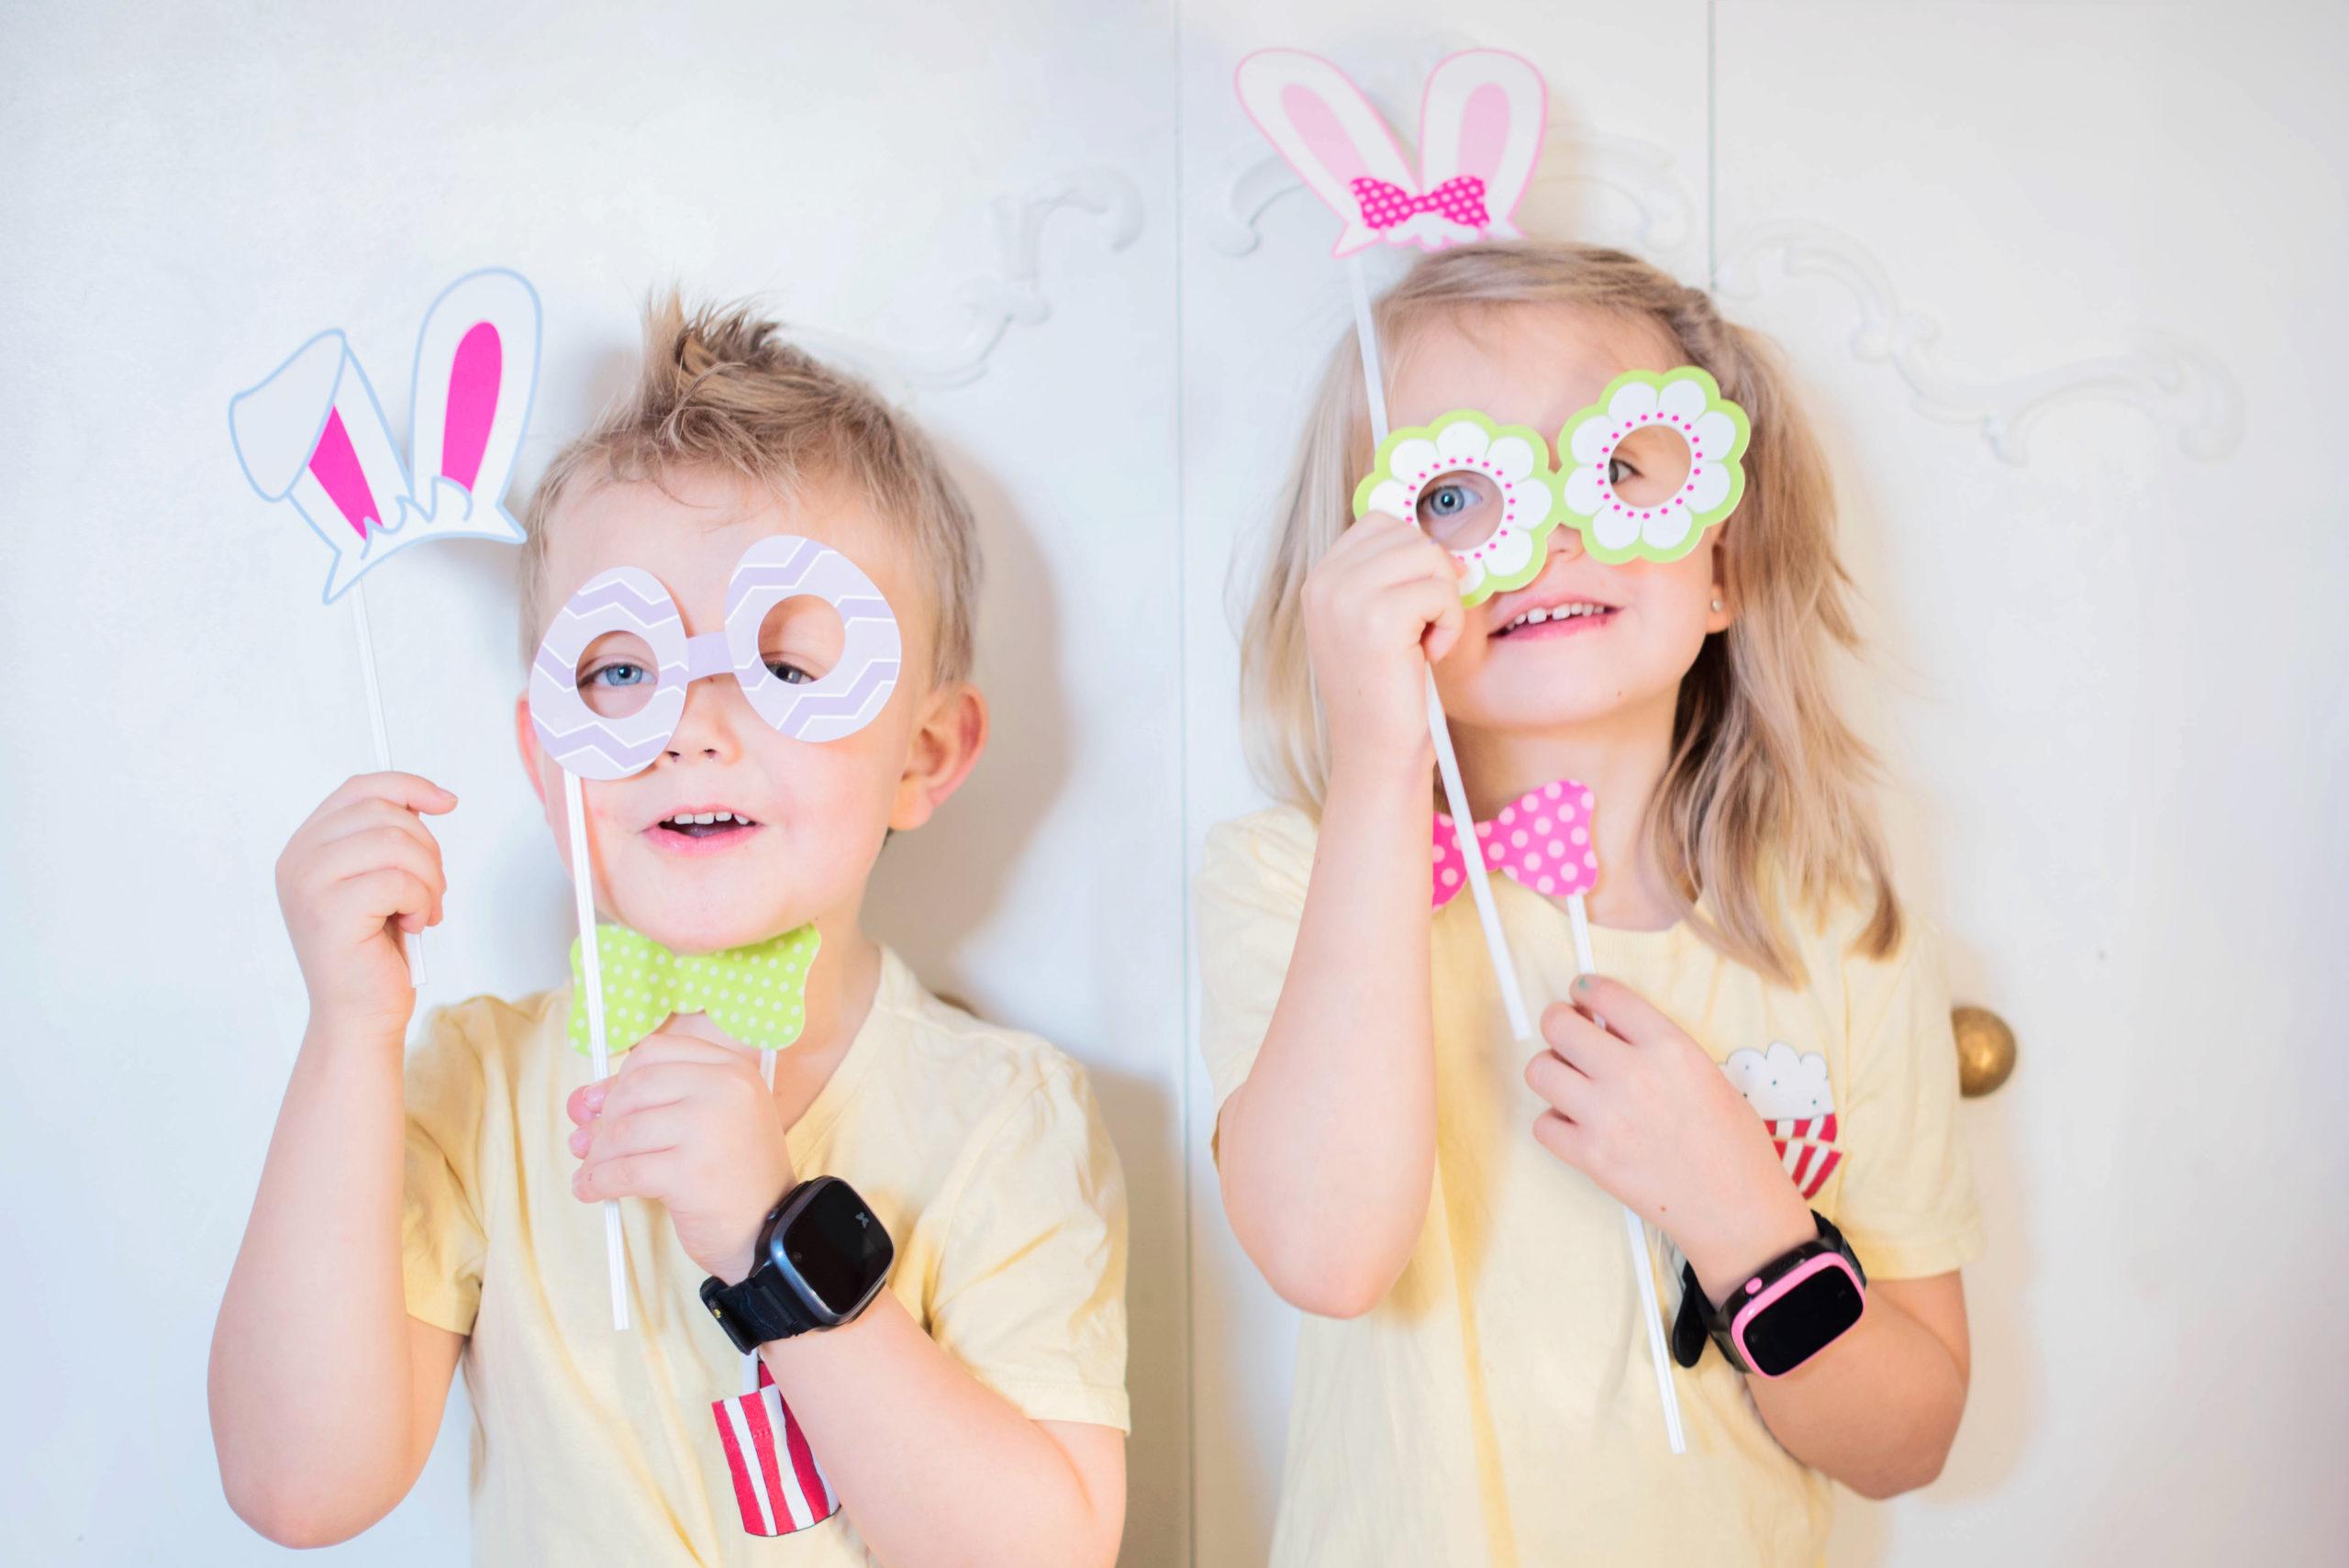 påskeferie med barn blogg